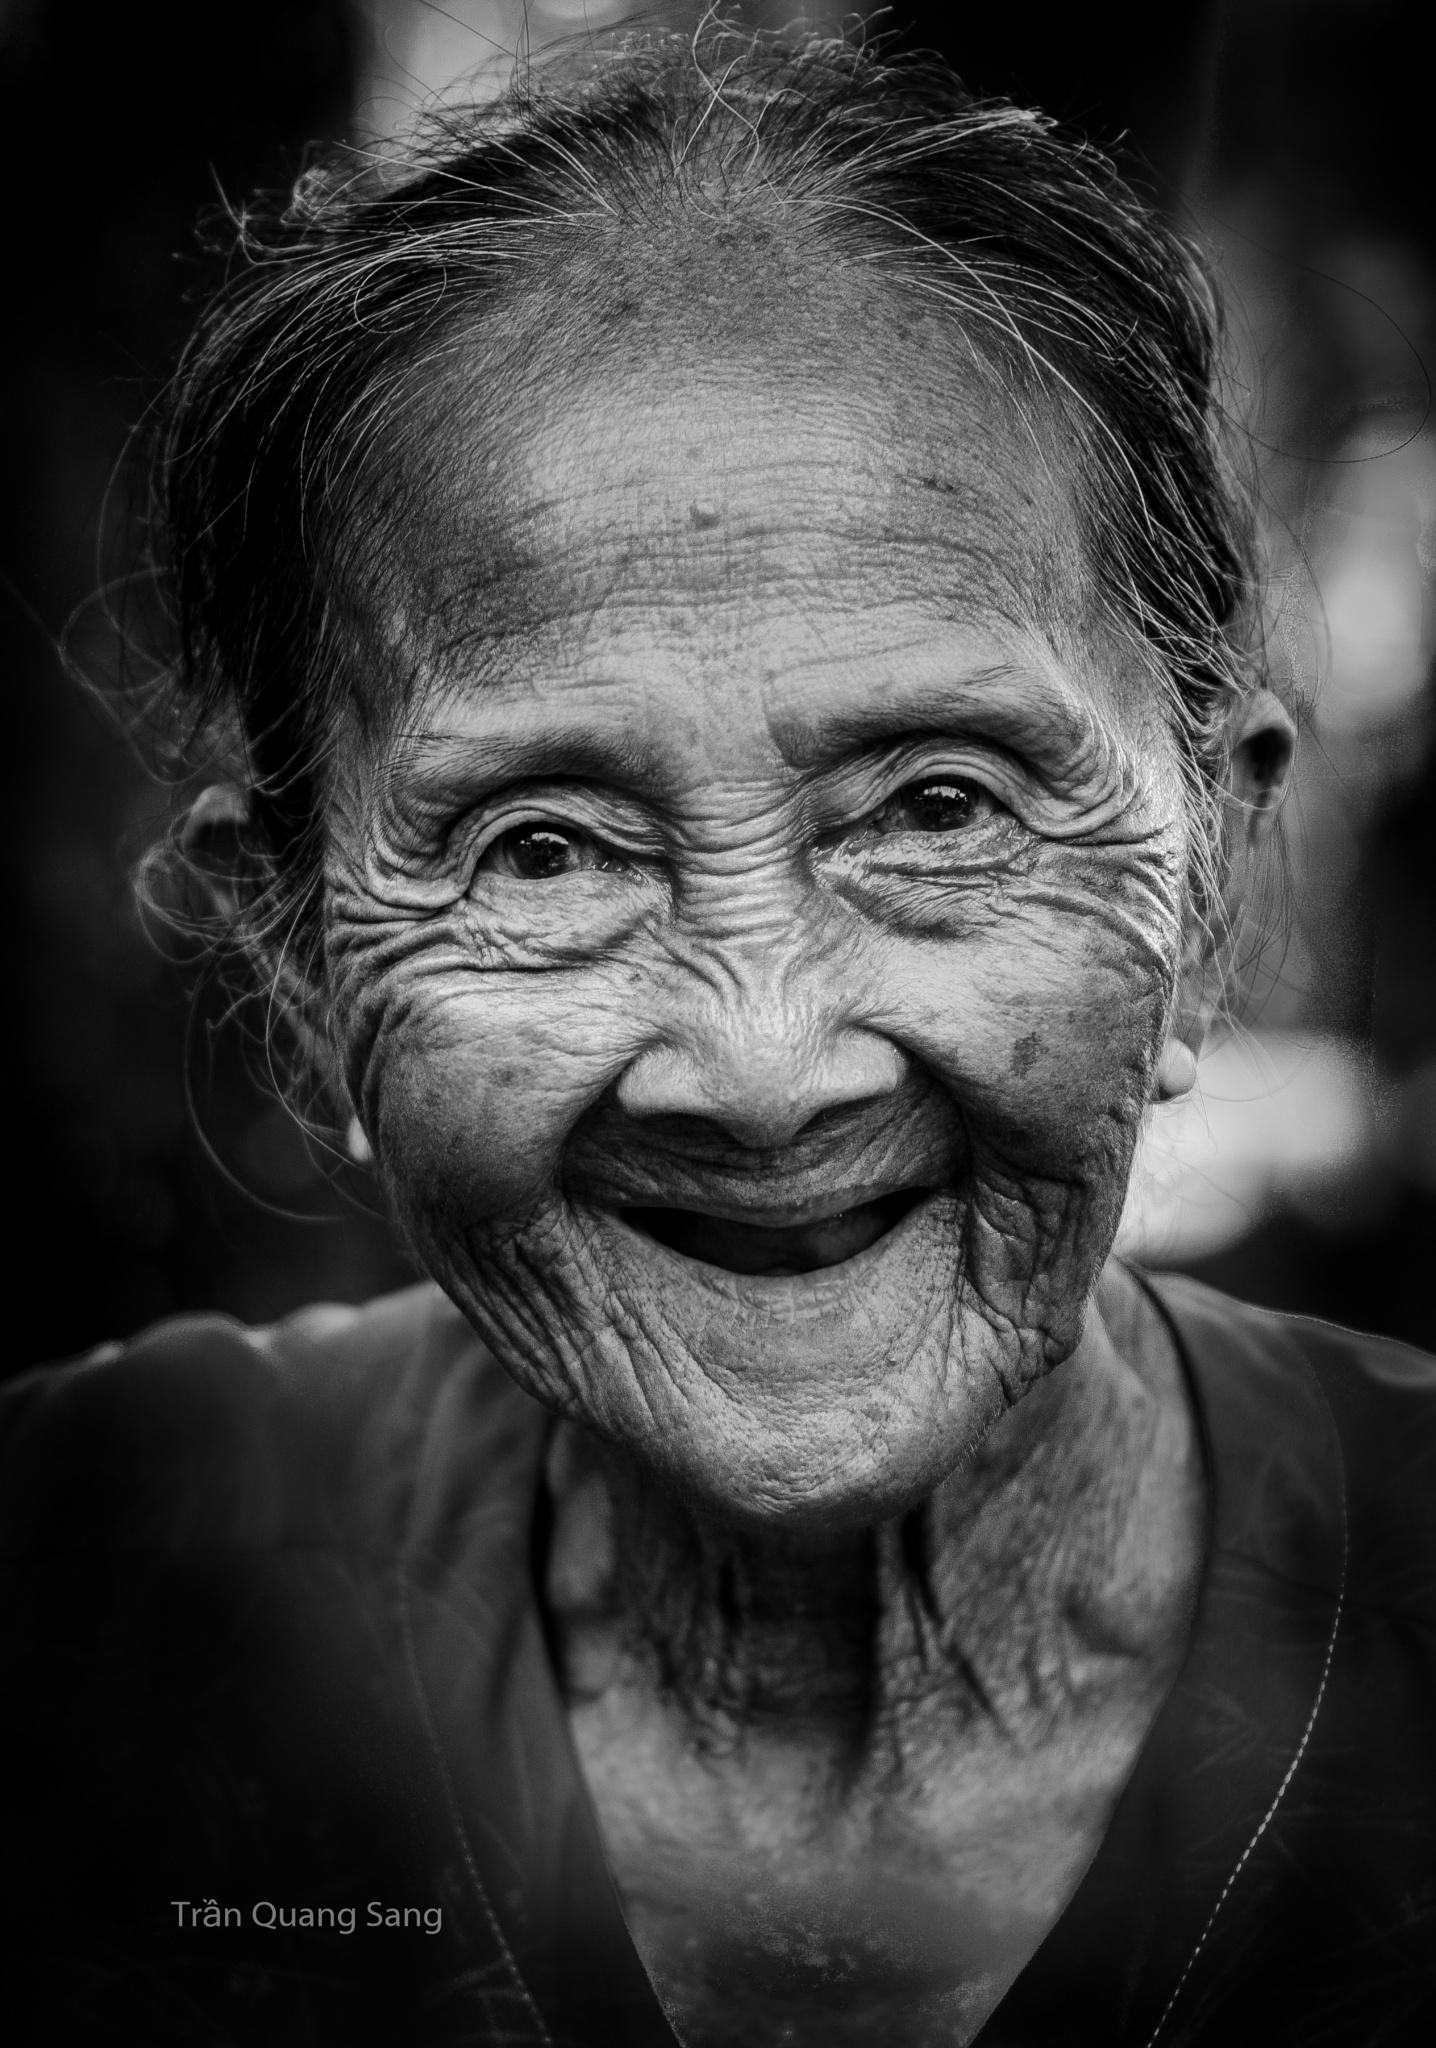 Smile by tranquangsang